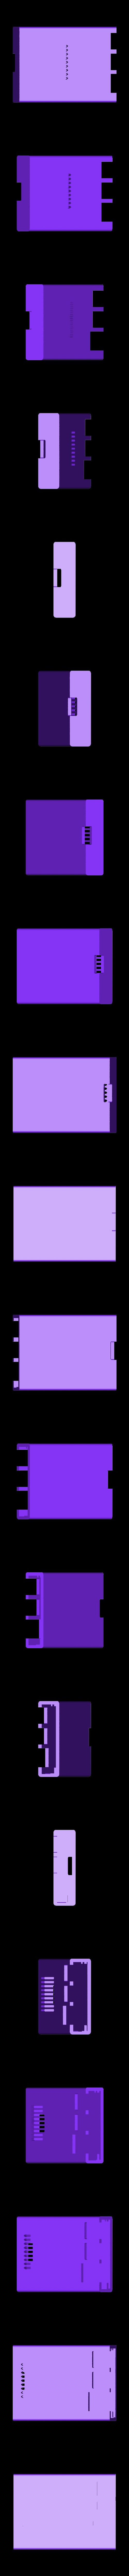 Raspberry_Pi_3B%2B_Sleeve.Sleeve.Body1-HDMI.stl Télécharger fichier STL gratuit Raspberry Pi 3B+ Sleeve • Design à imprimer en 3D, Wilko